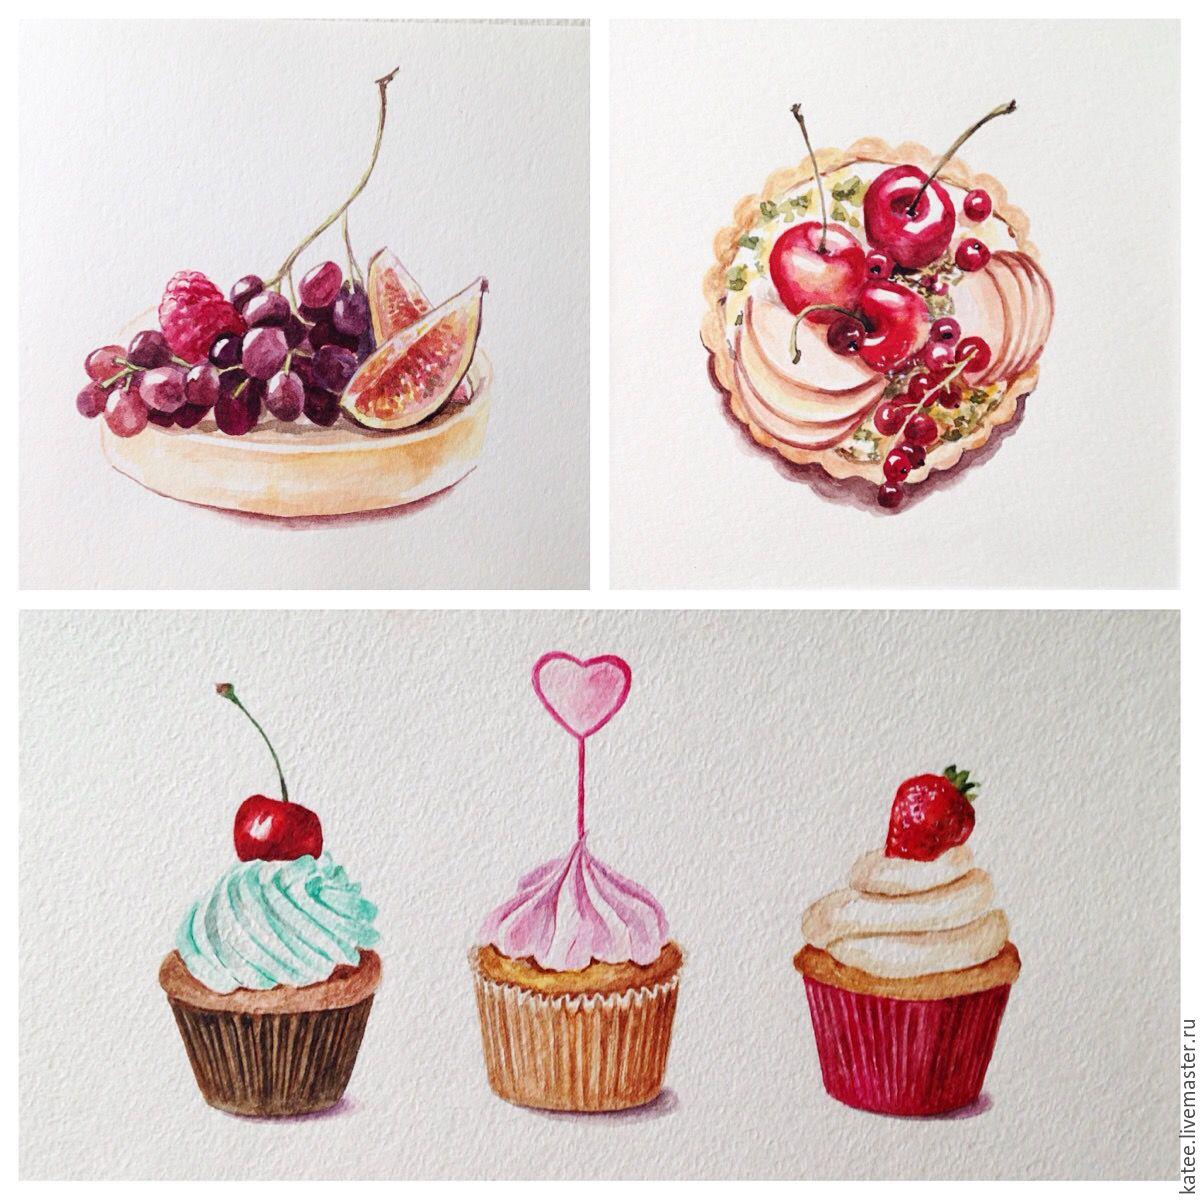 сладости и вкусняшки картинки